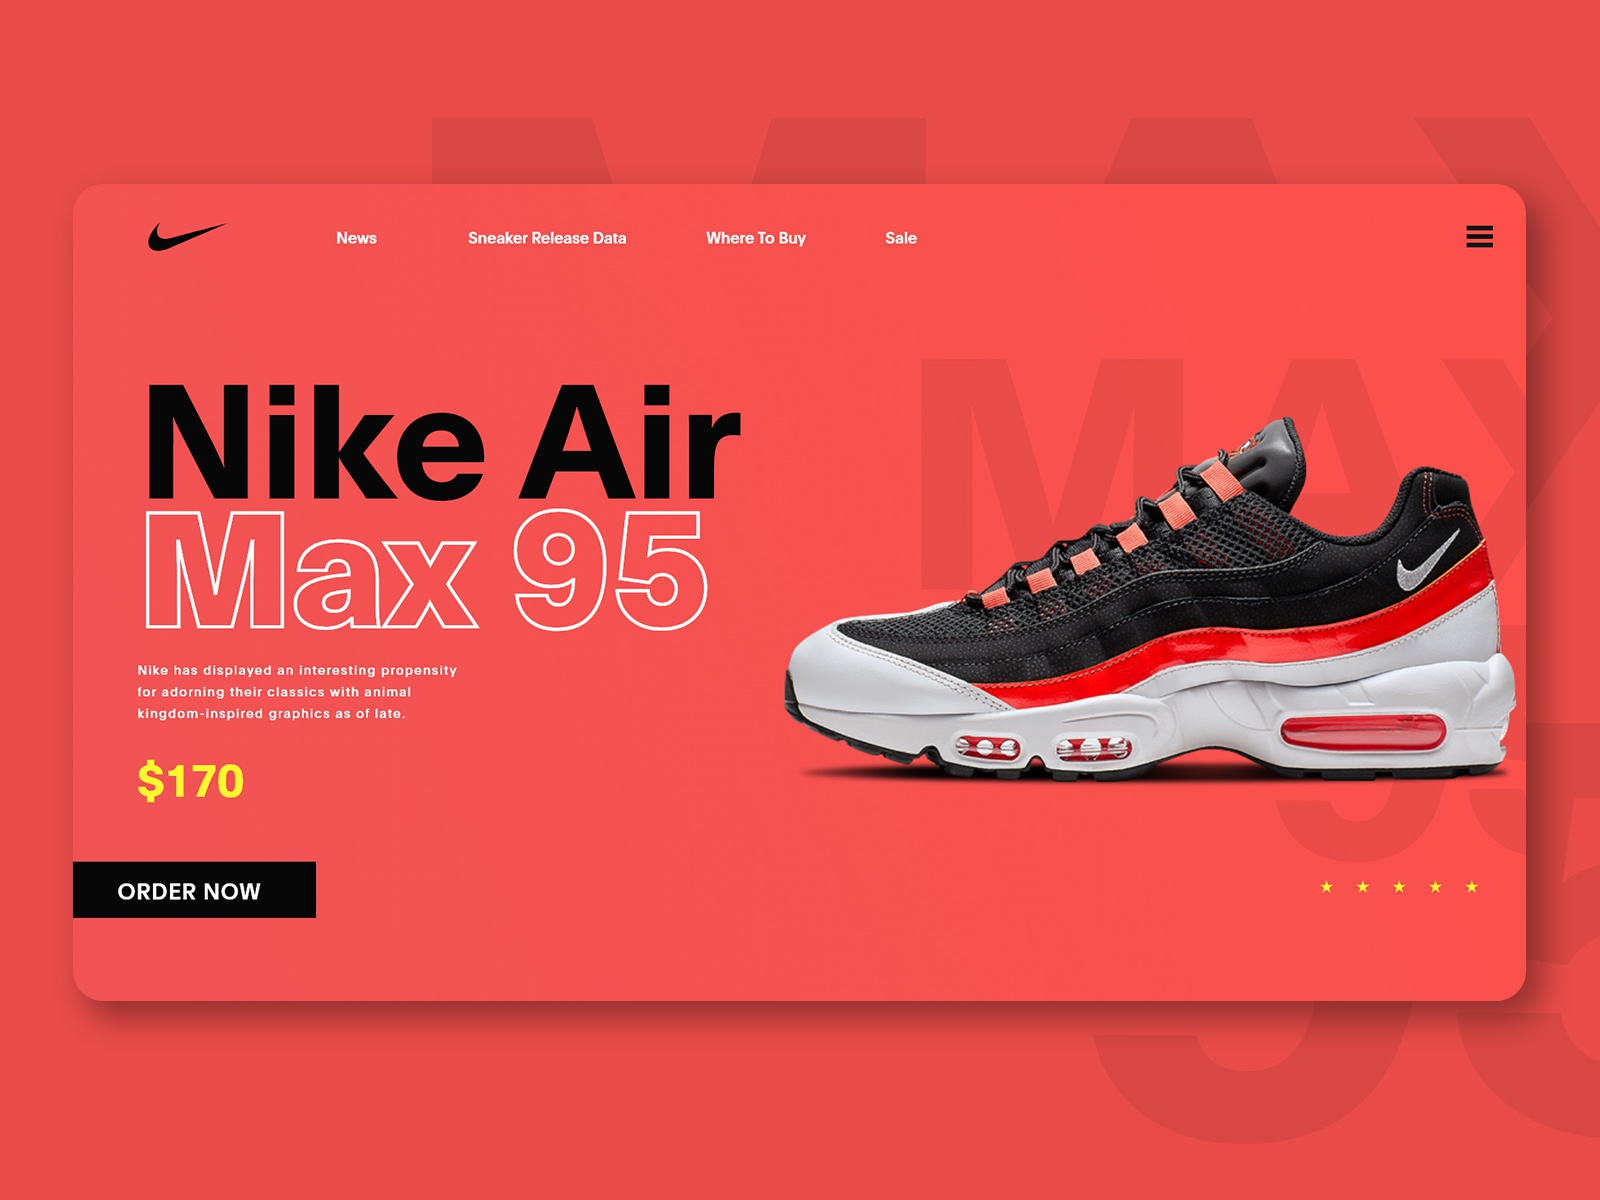 Nike Air Max 95 by Rendi Maulana on